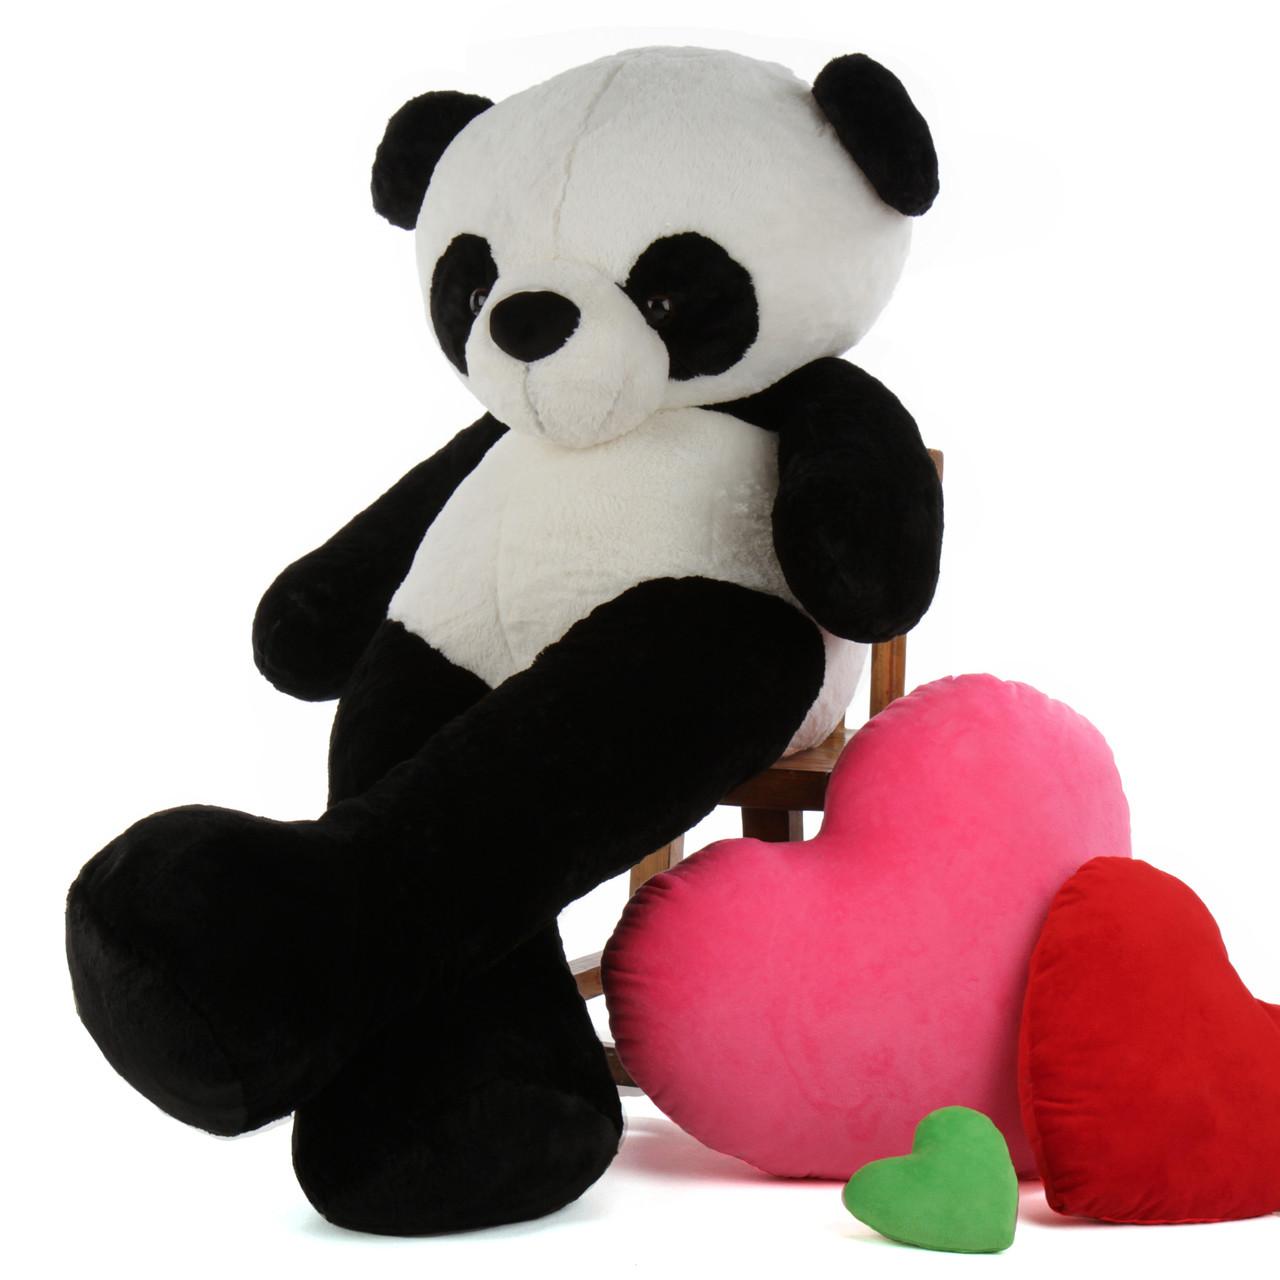 c77437d3283 60in Huge Life Size Panda Teddy Bear Precious Xiong